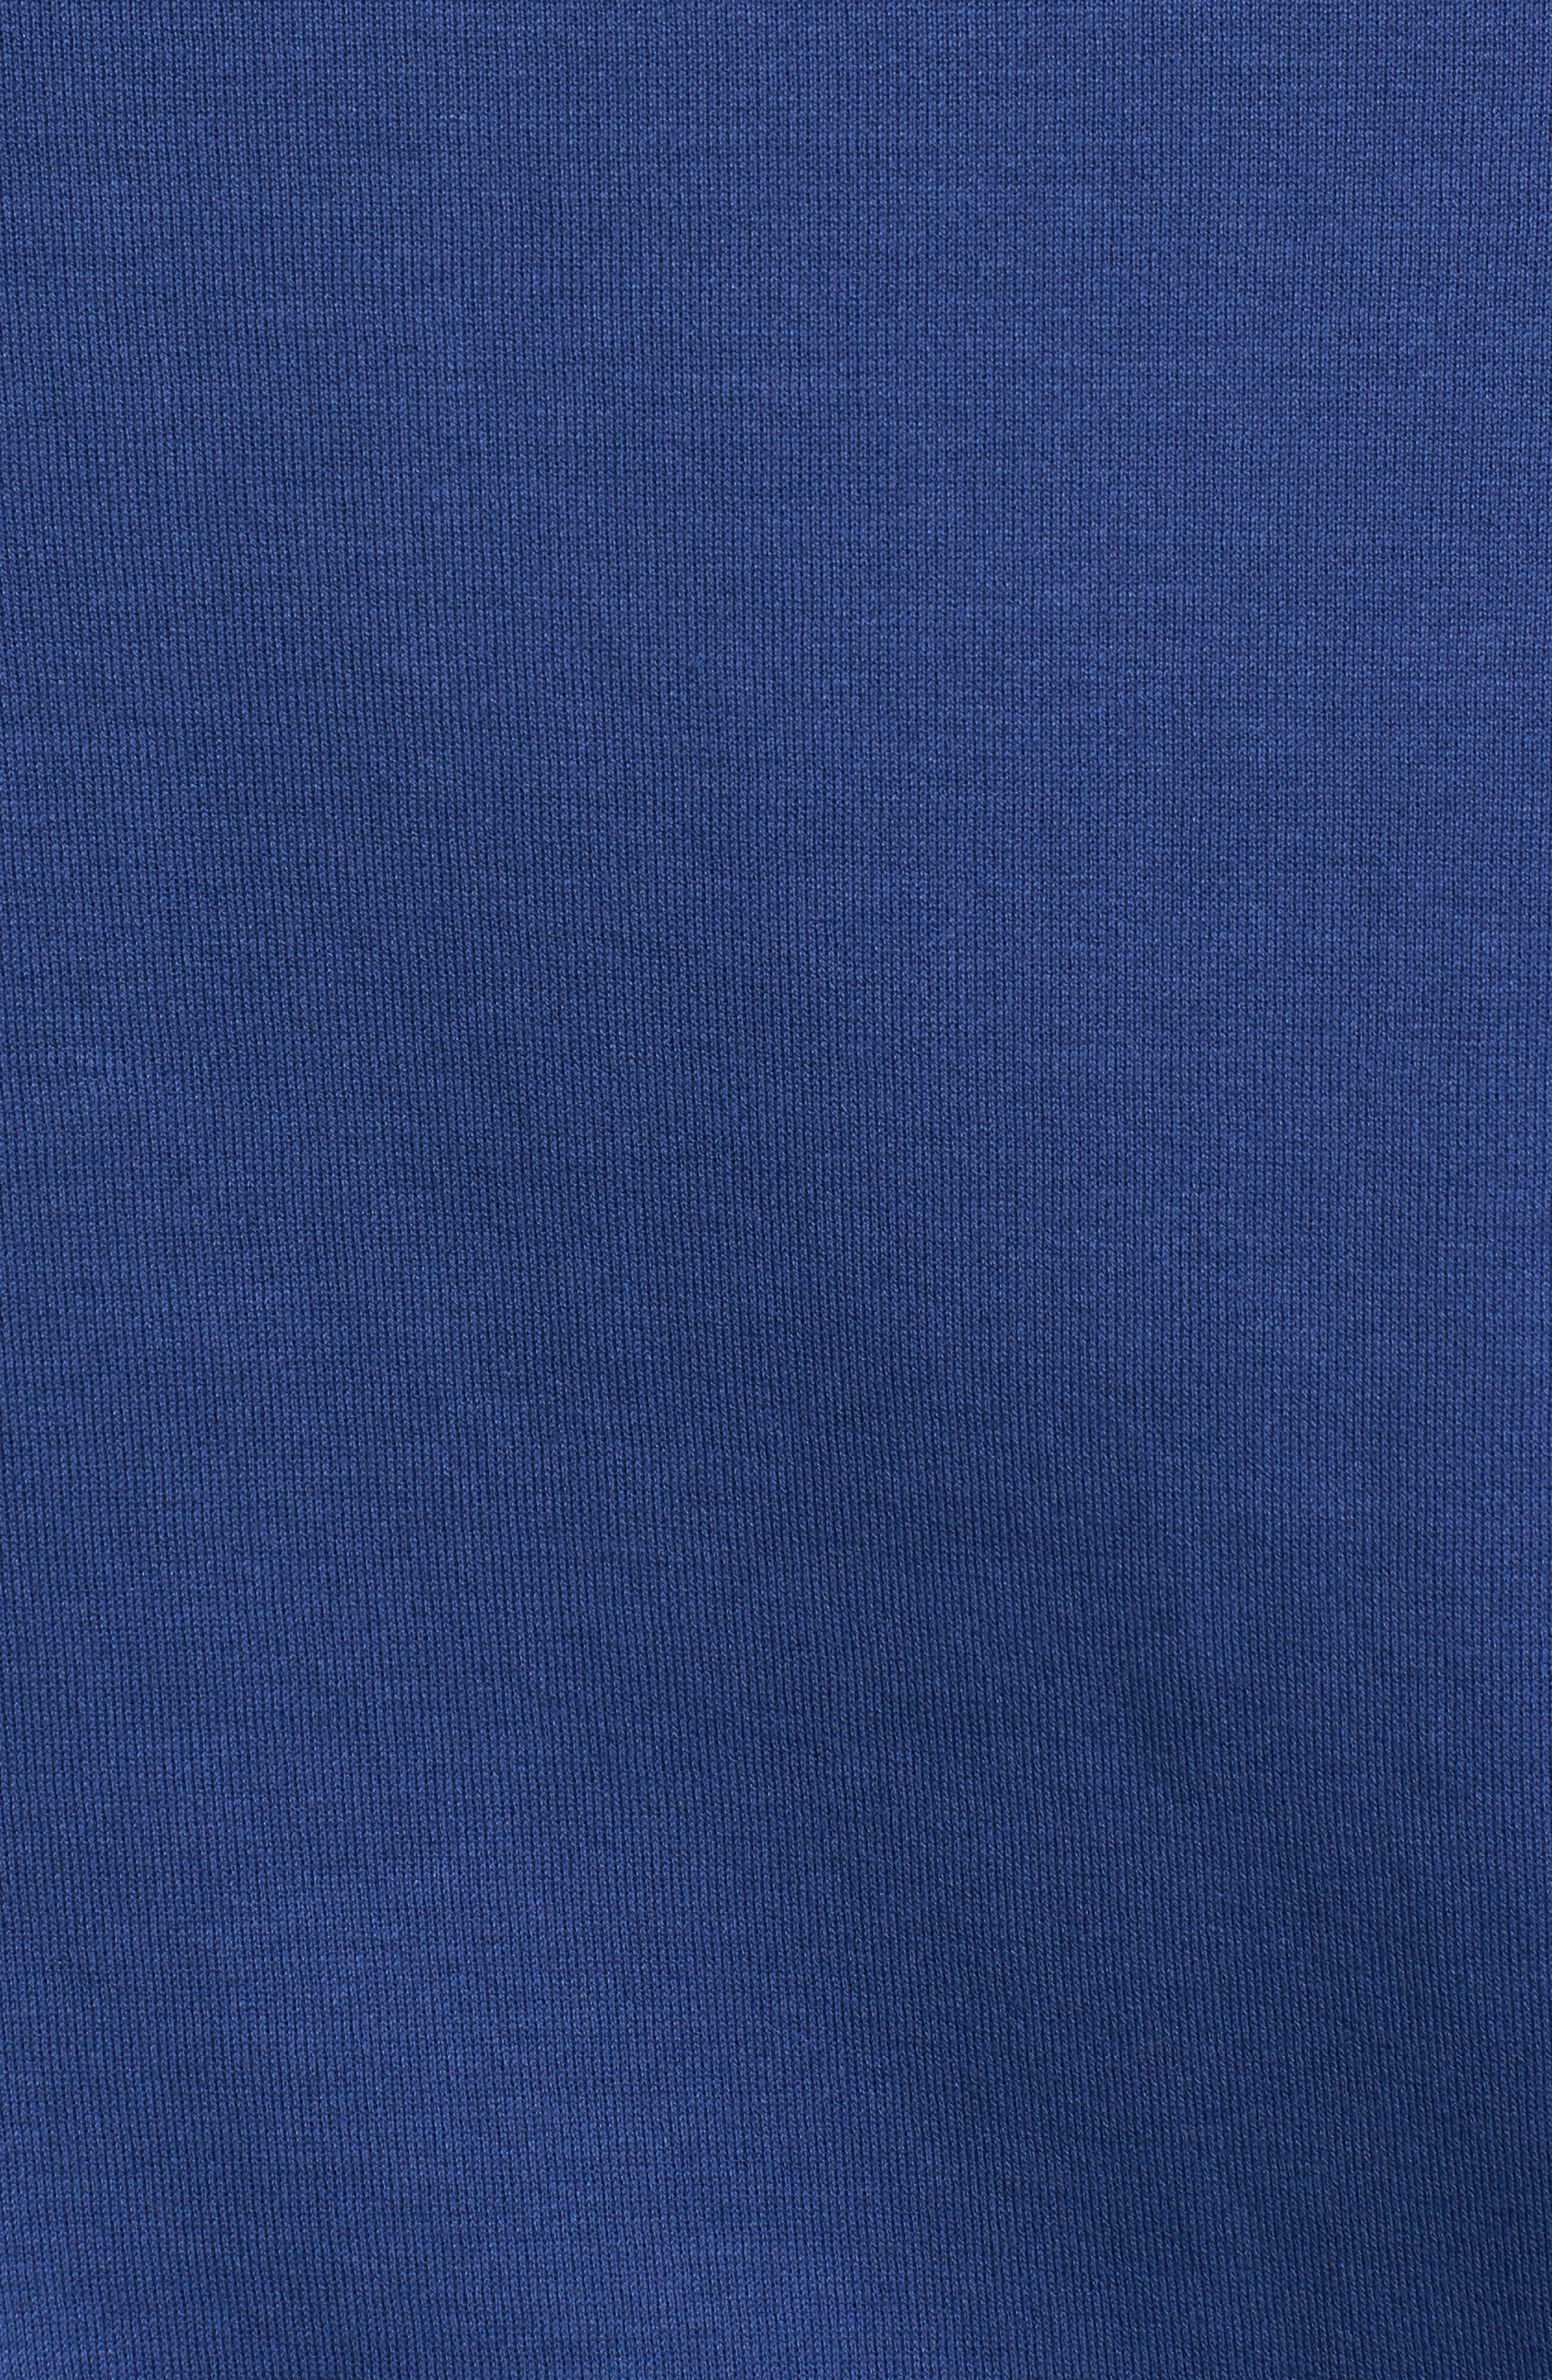 Regular Fit Knit Quarter Zip Pullover,                             Alternate thumbnail 18, color,